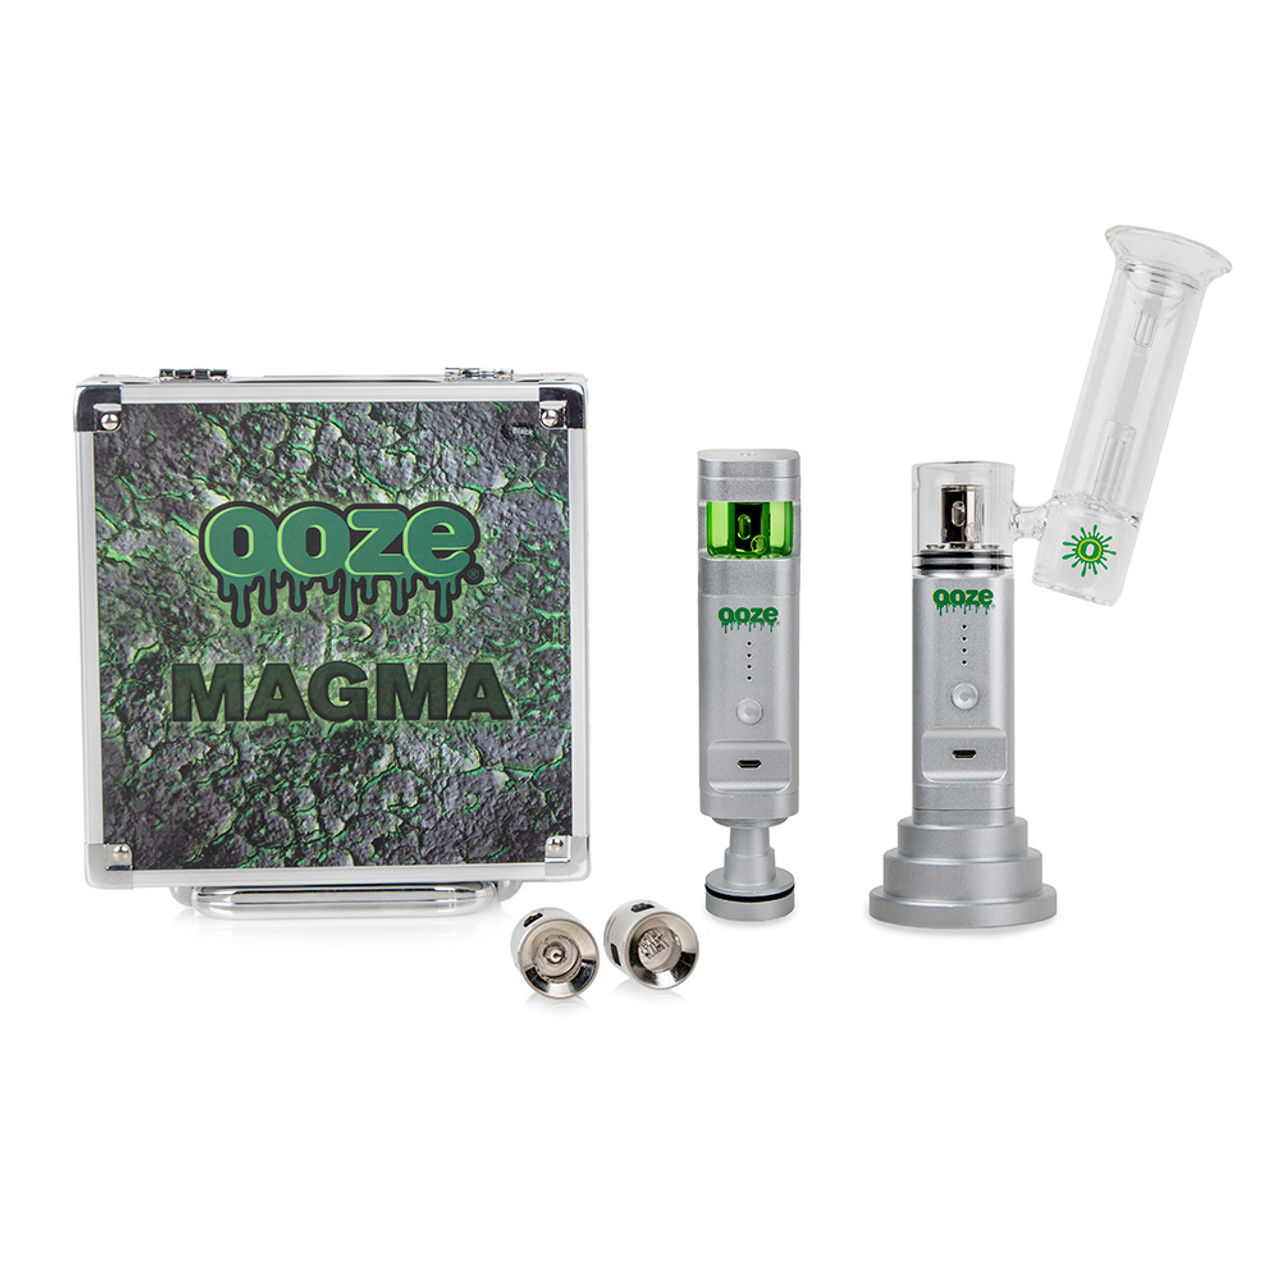 Ooze Magma E-Rig & E-Nail Kit